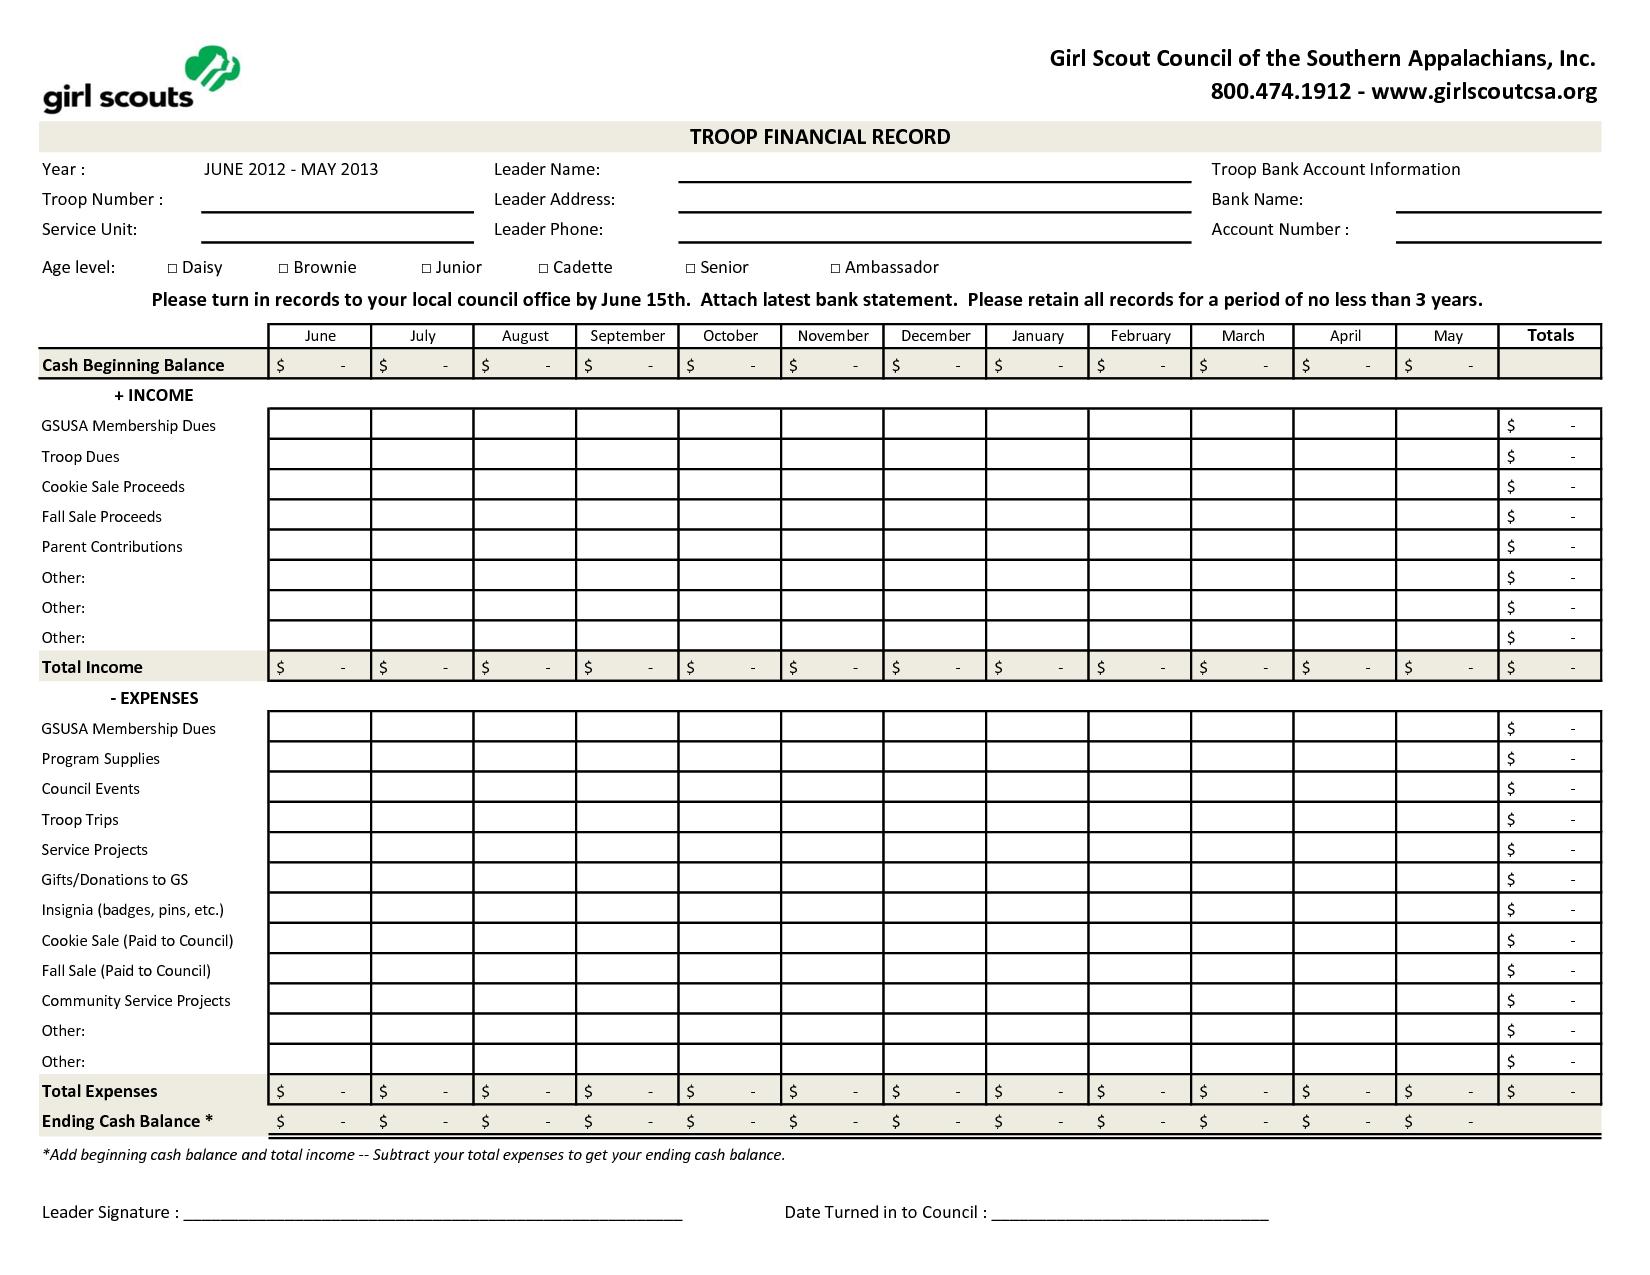 Excel Version Of Troop Financial Record